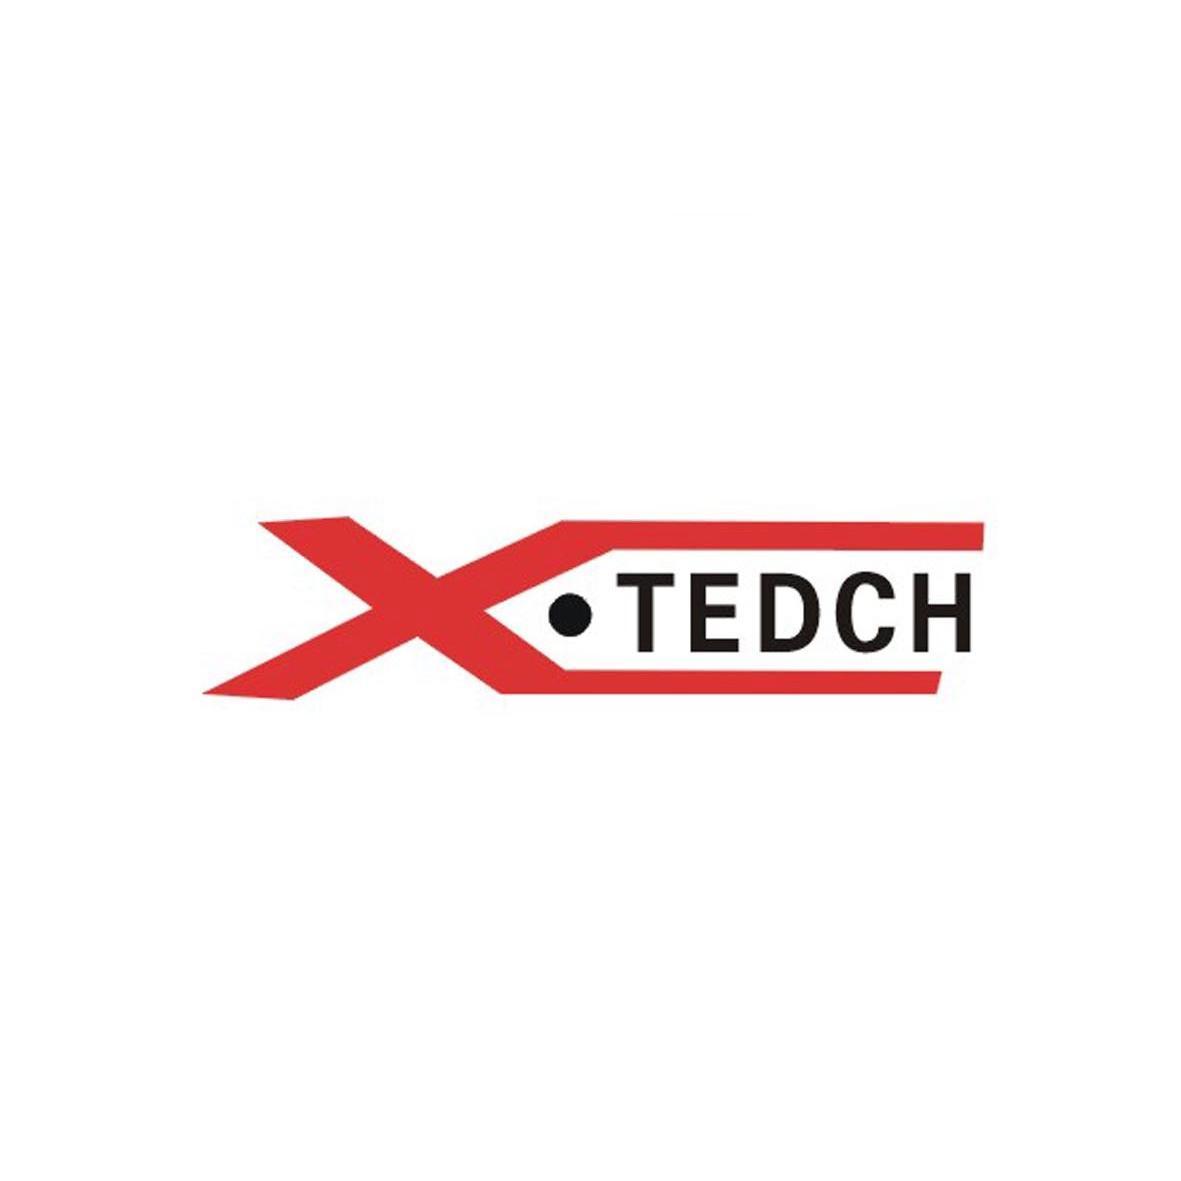 X·TEDCH